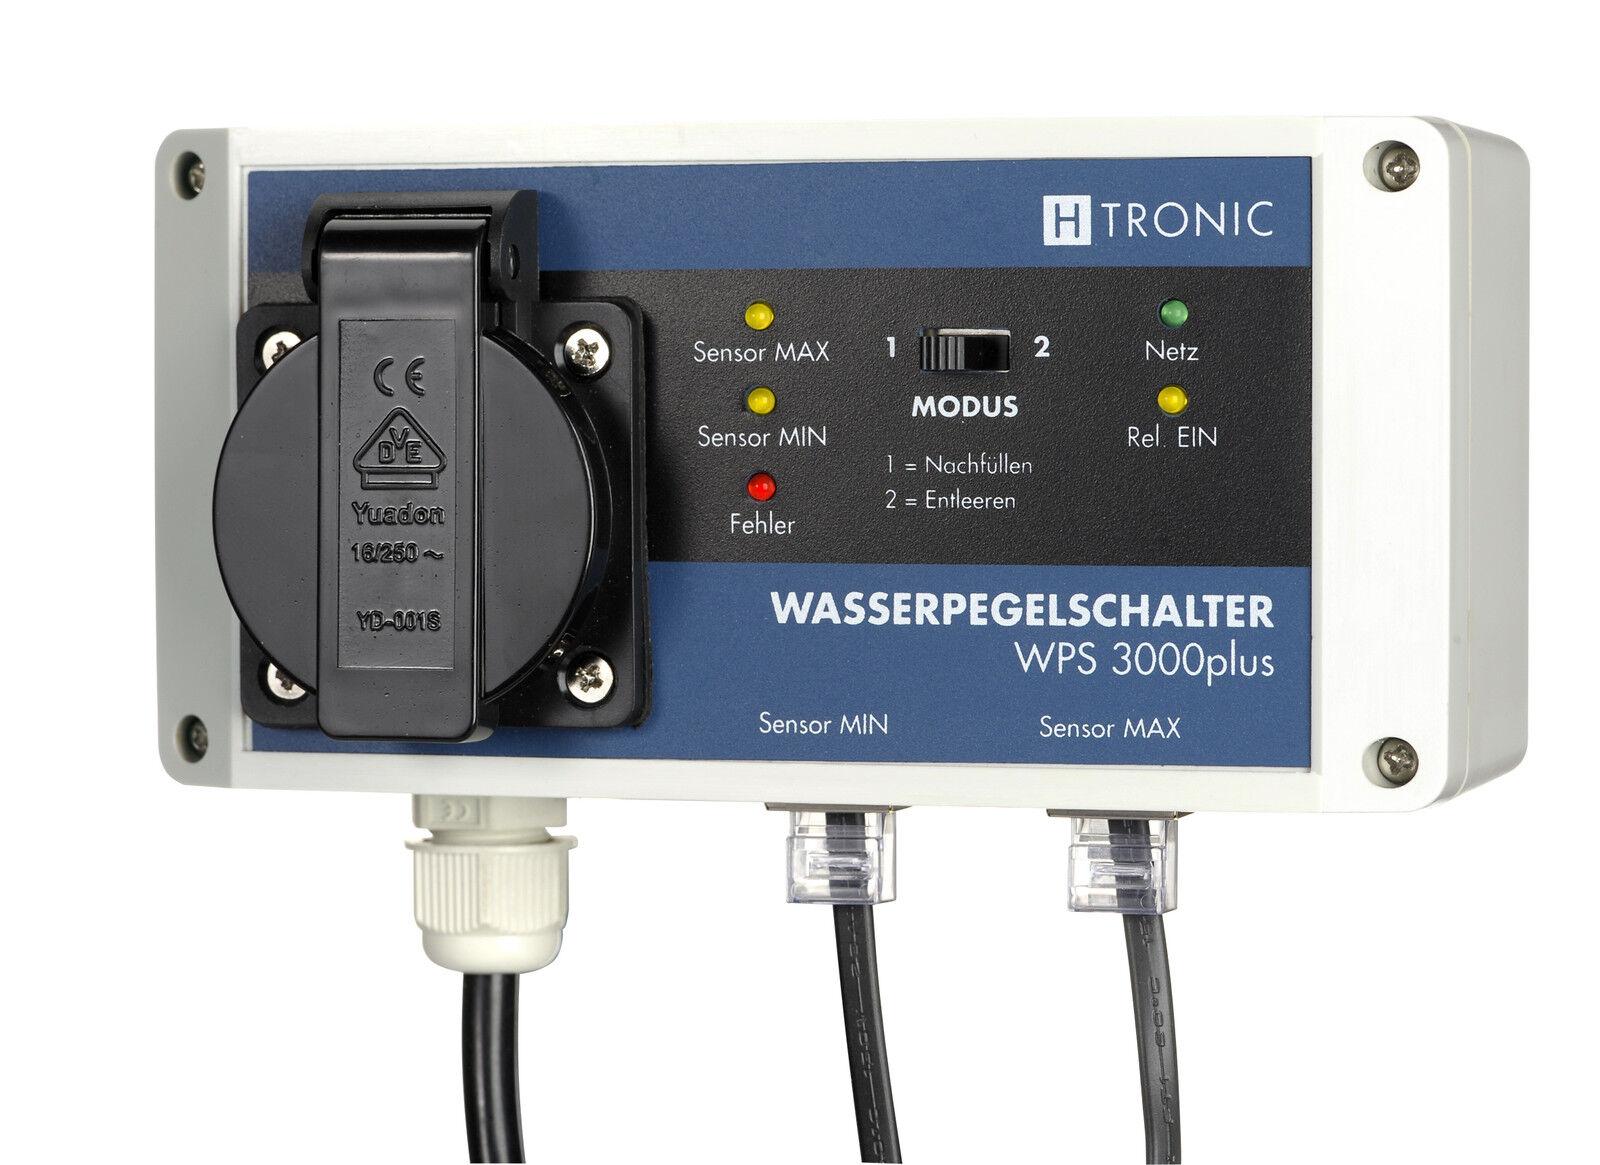 Interruptor Nivel de Agua Wps3000plus, Perfecto con 2 Sensores súpervisar